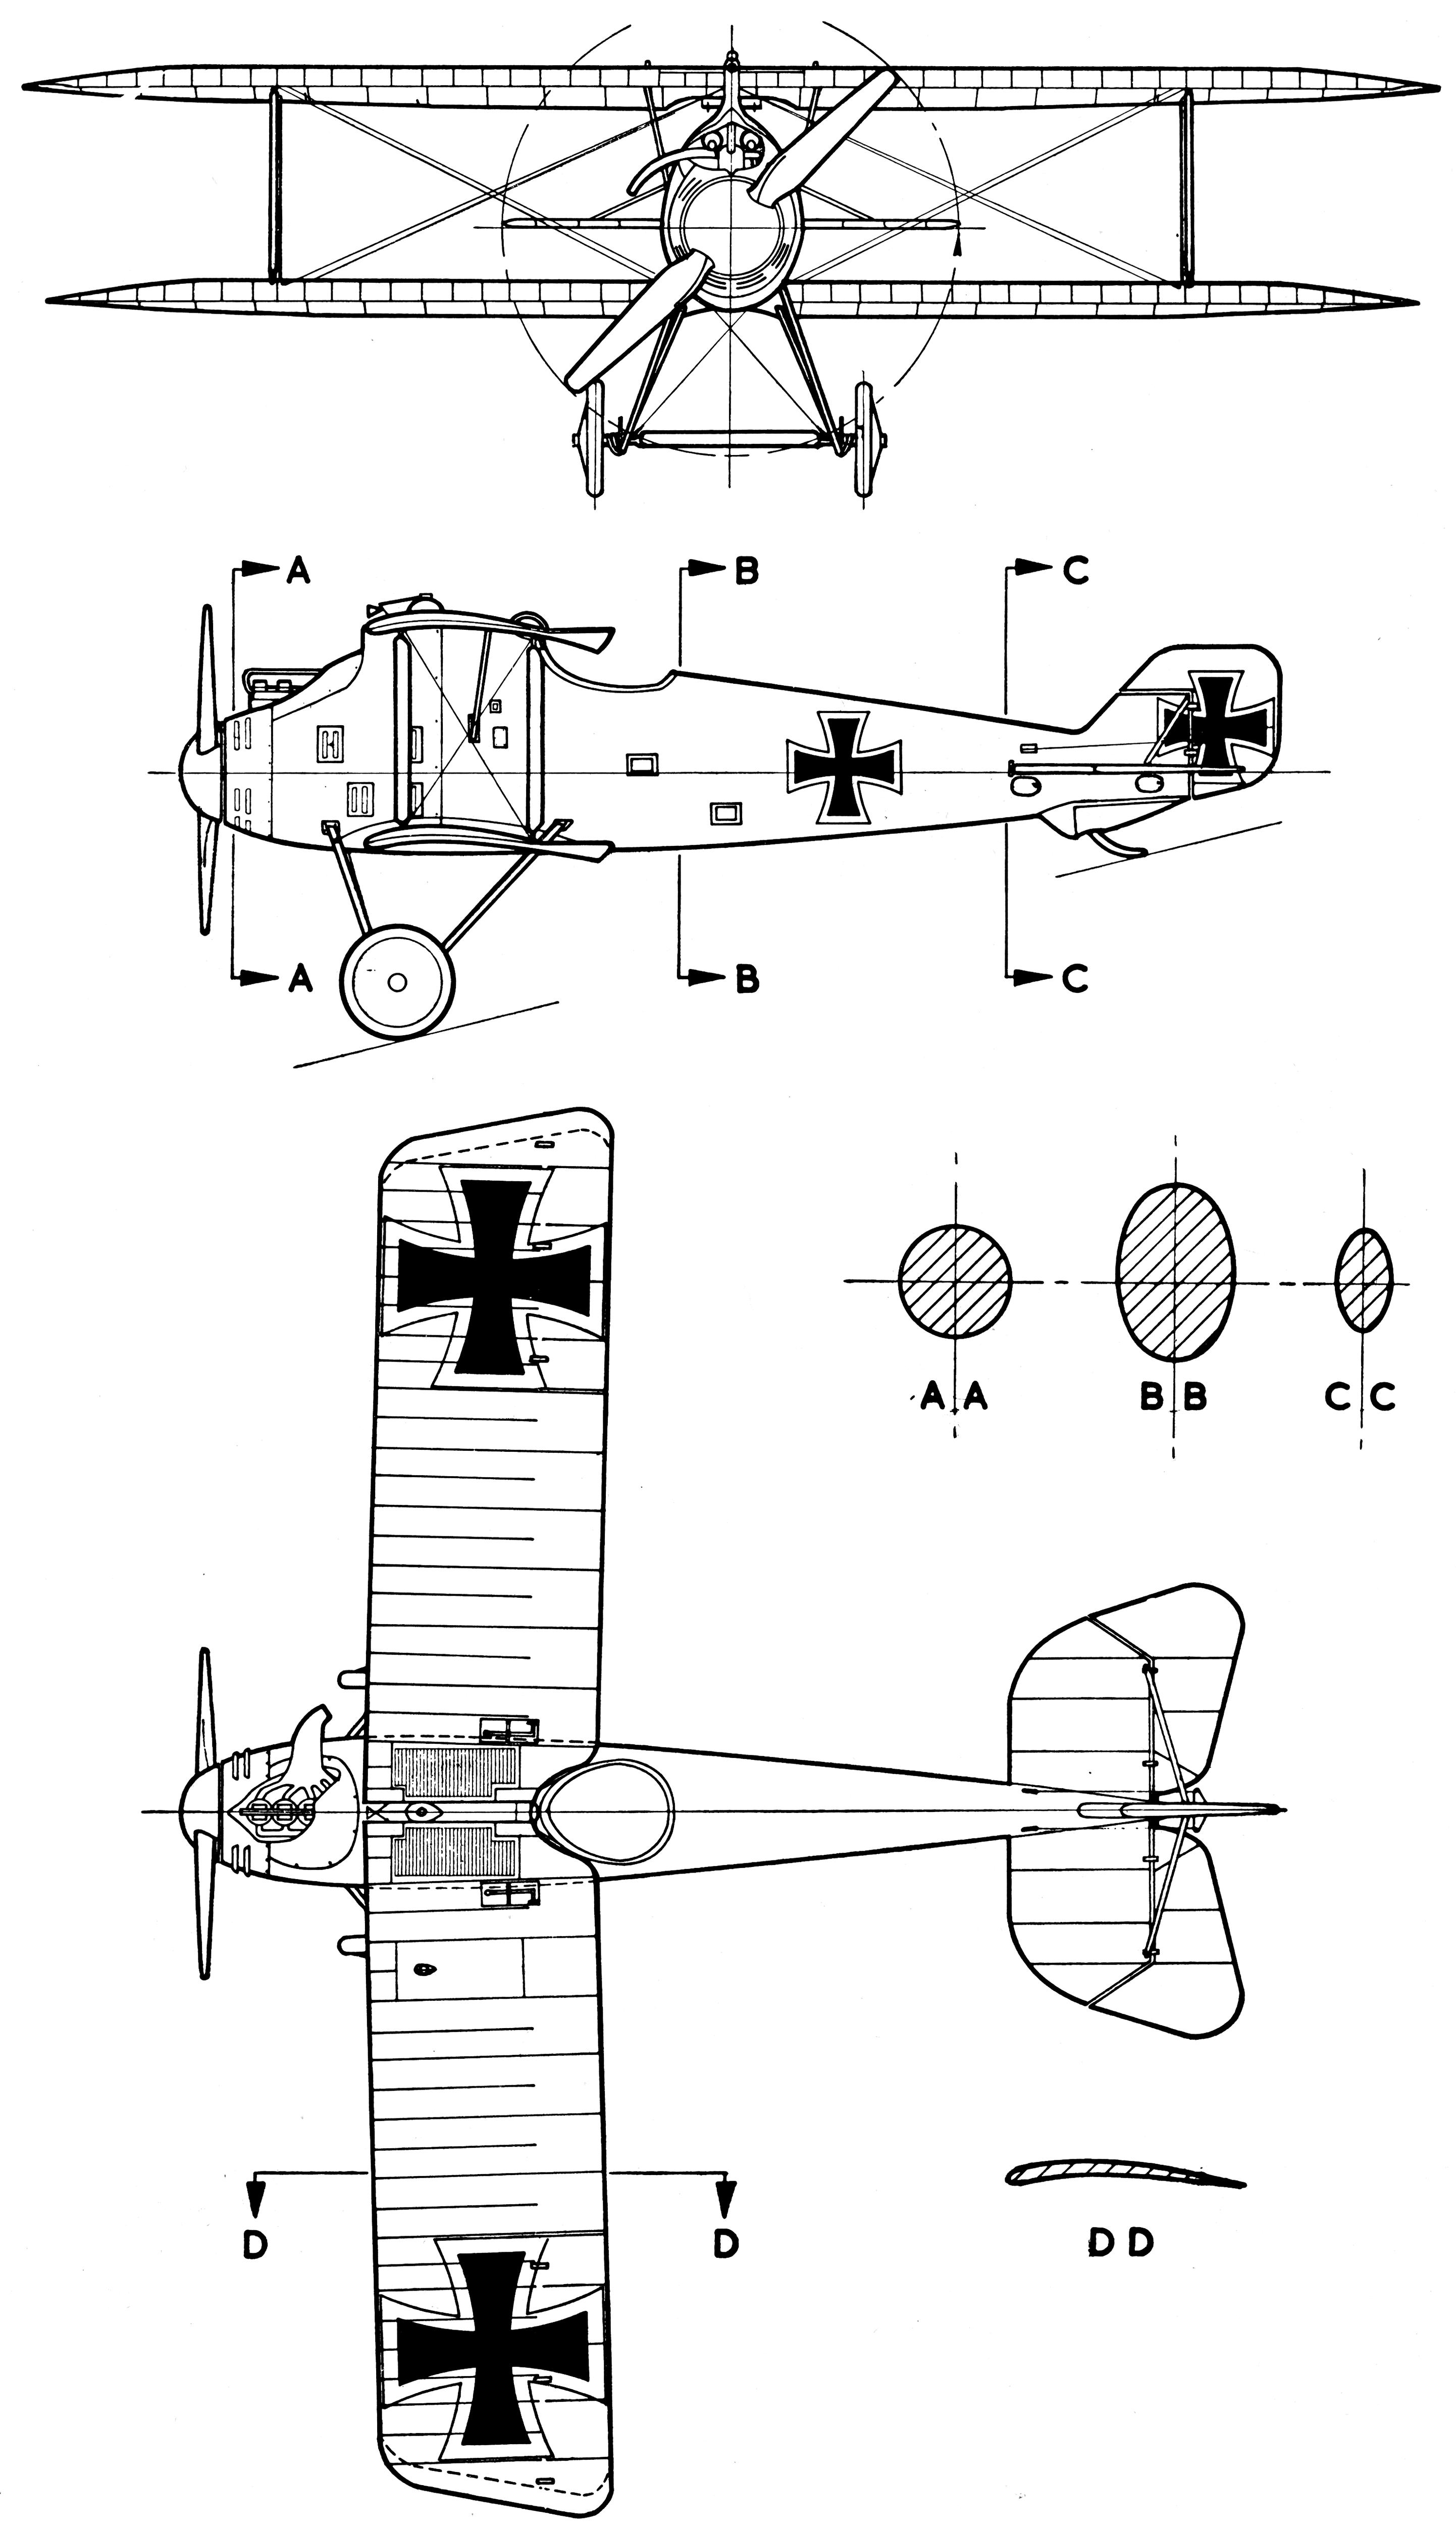 LFG Roland D.II blueprint